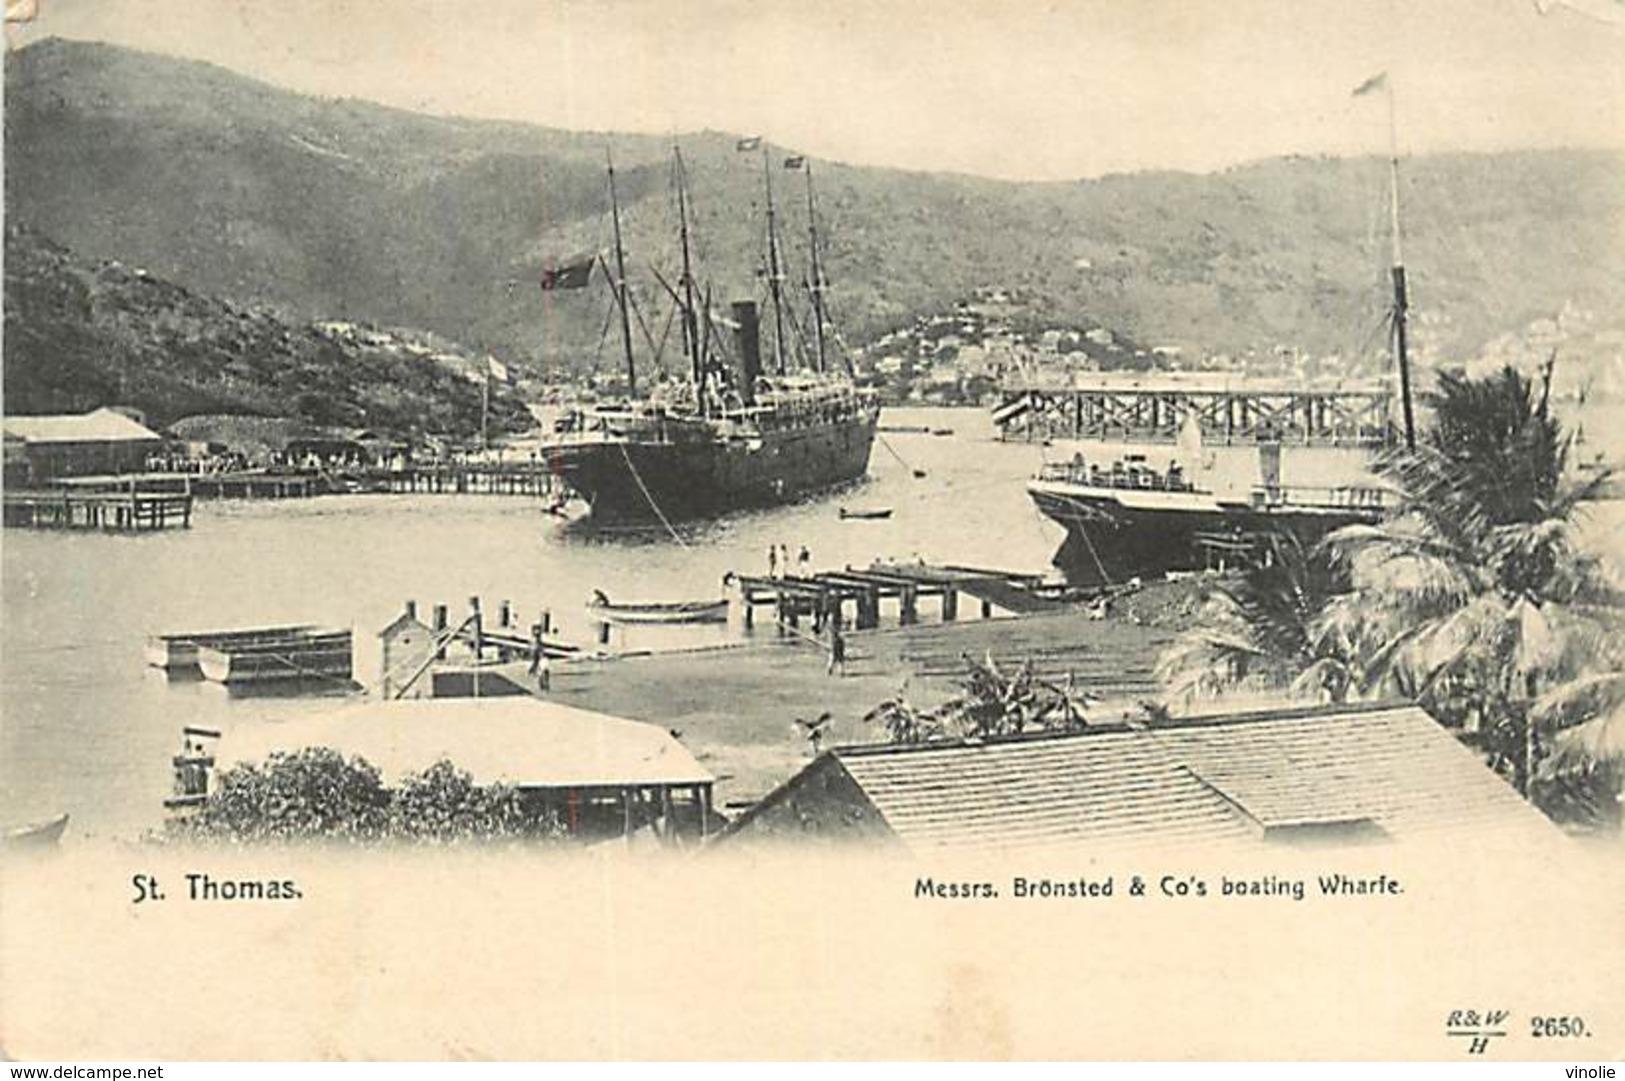 PIE-R-18-1773 : SAINT THOMAS. MESSRS BRÖNSTED & CO'S BOATING WHARFE - Antilles Neérlandaises